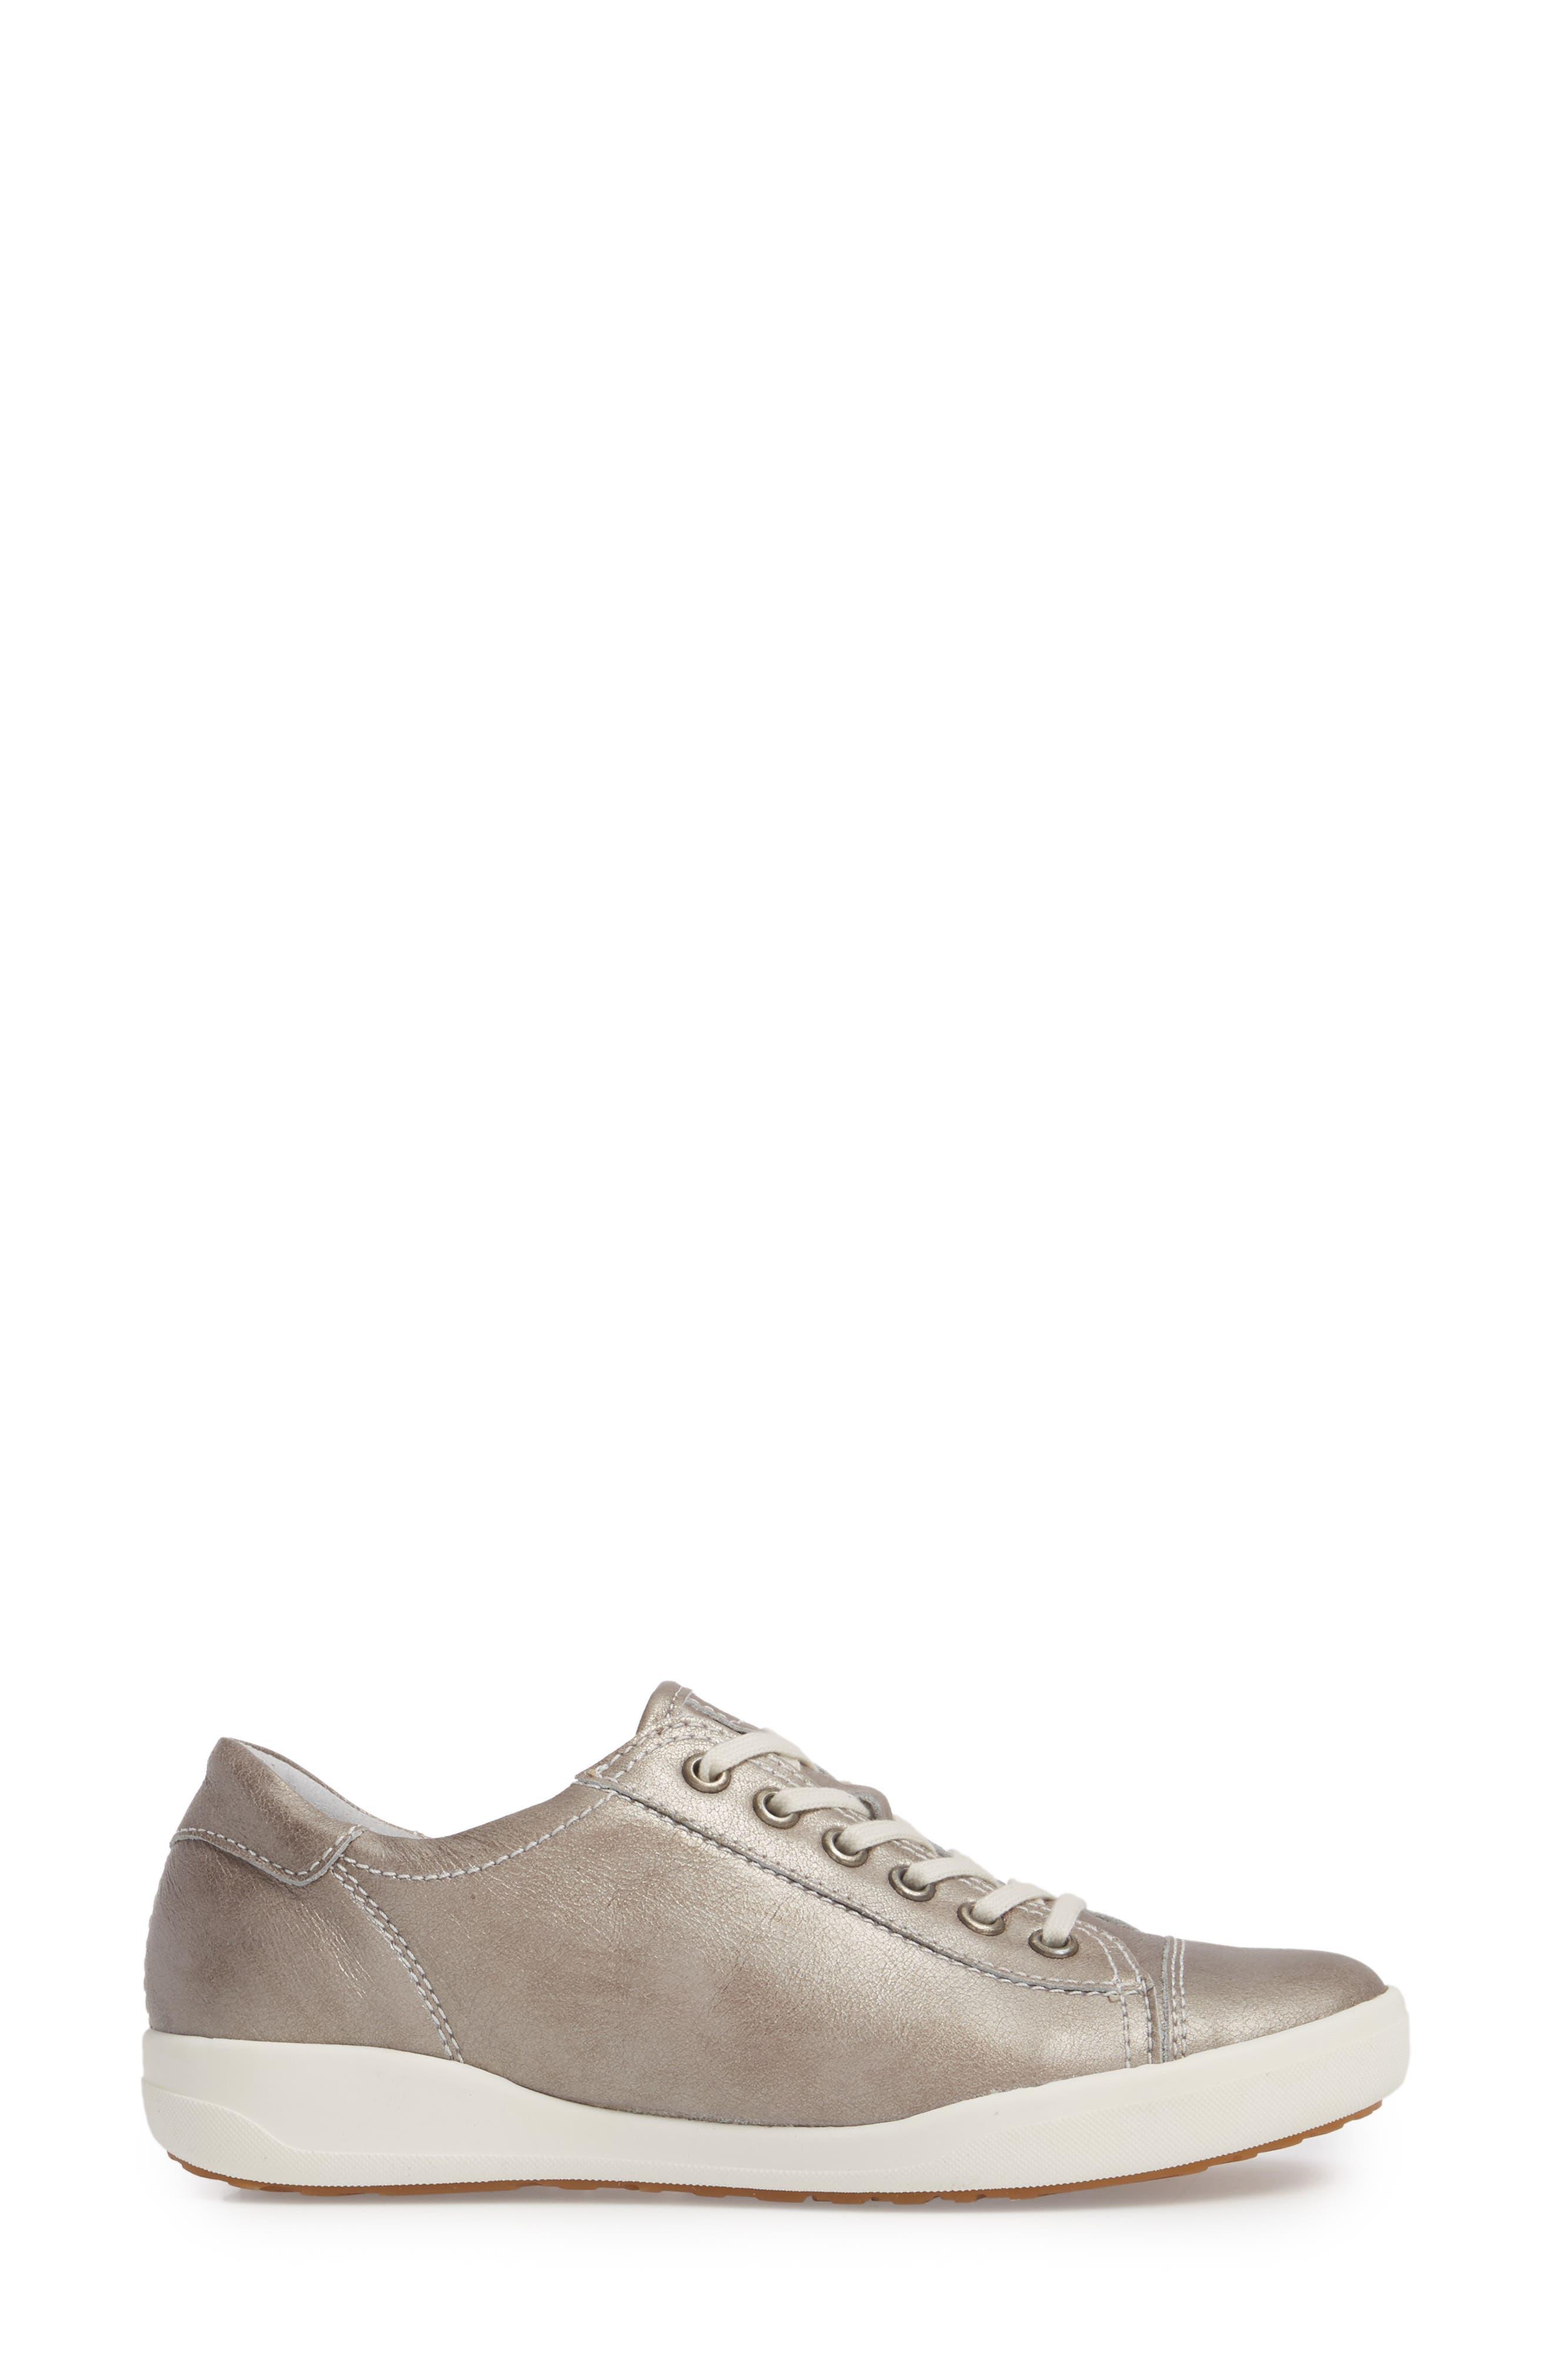 Sina 11 Sneaker,                             Alternate thumbnail 3, color,                             Platin Leather